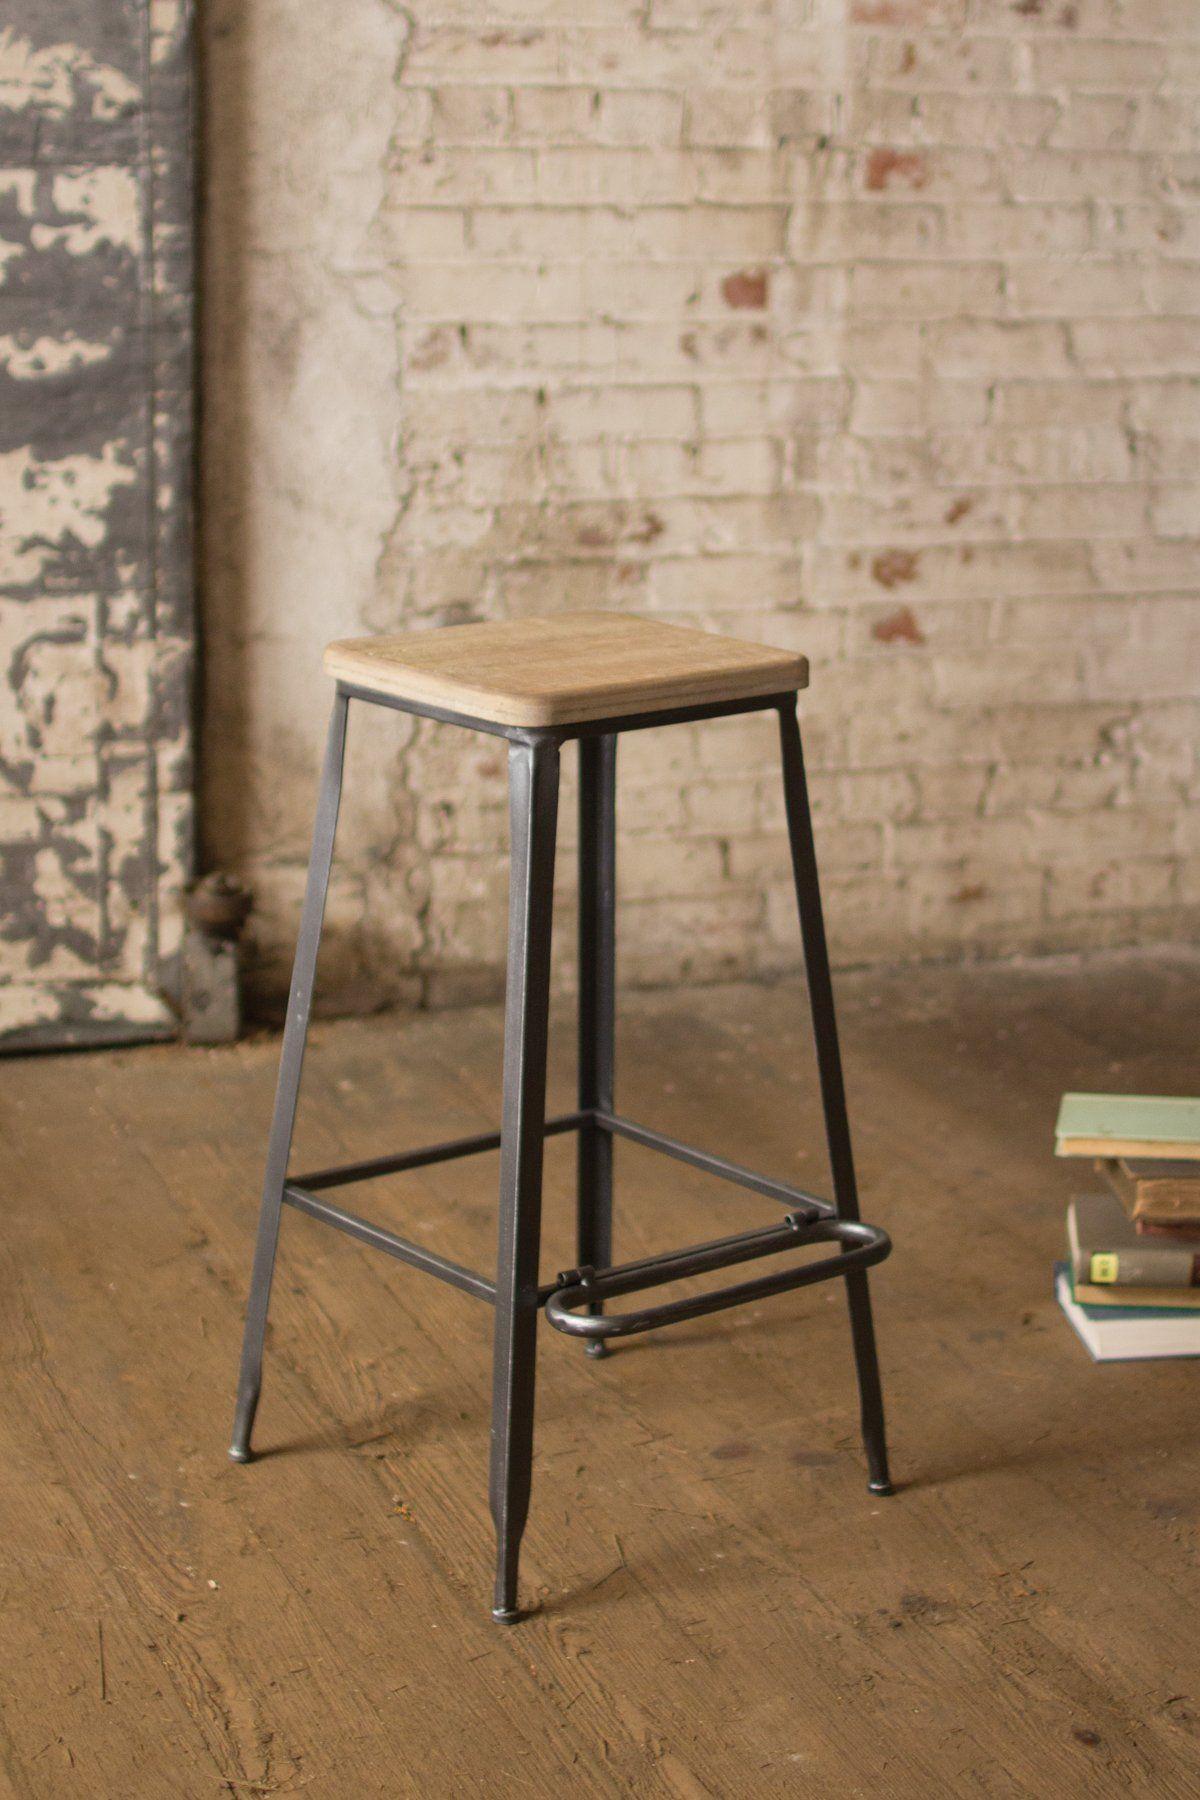 Metal Bar Stool With Square Wooden Seat Metal Bar Stools White